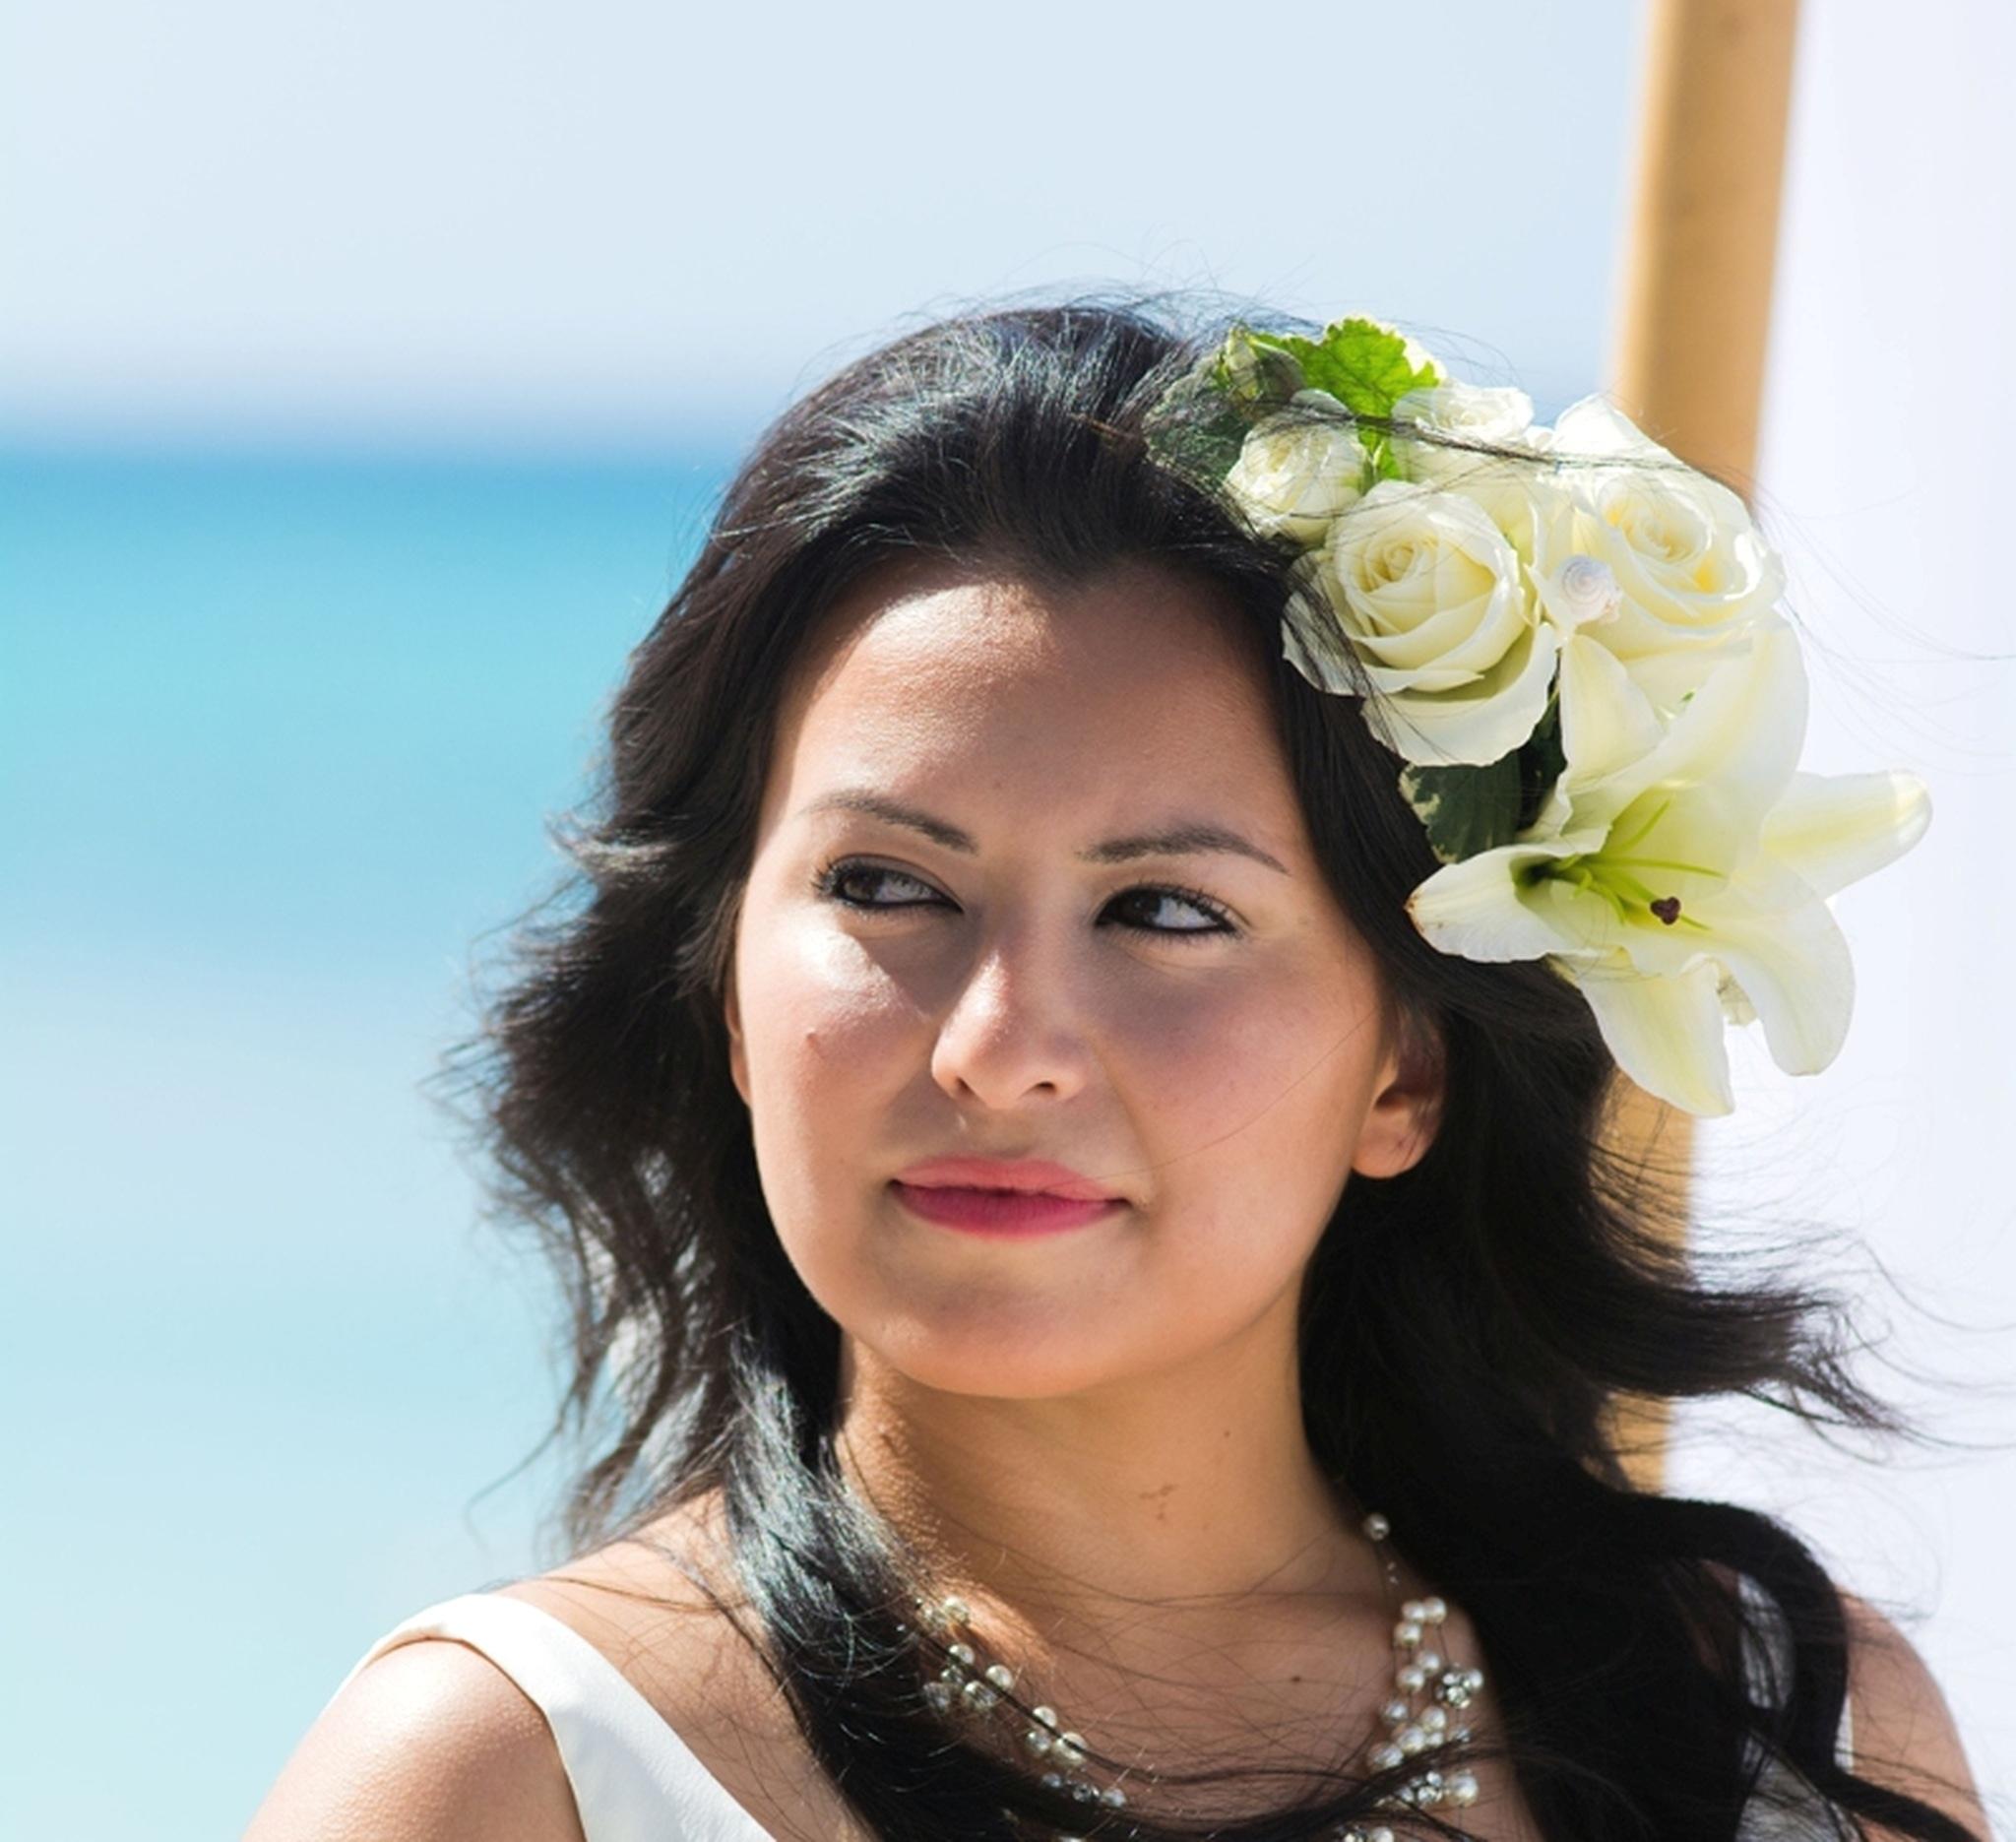 The-Flower-Dell-Bridal-Hair-5.jpg